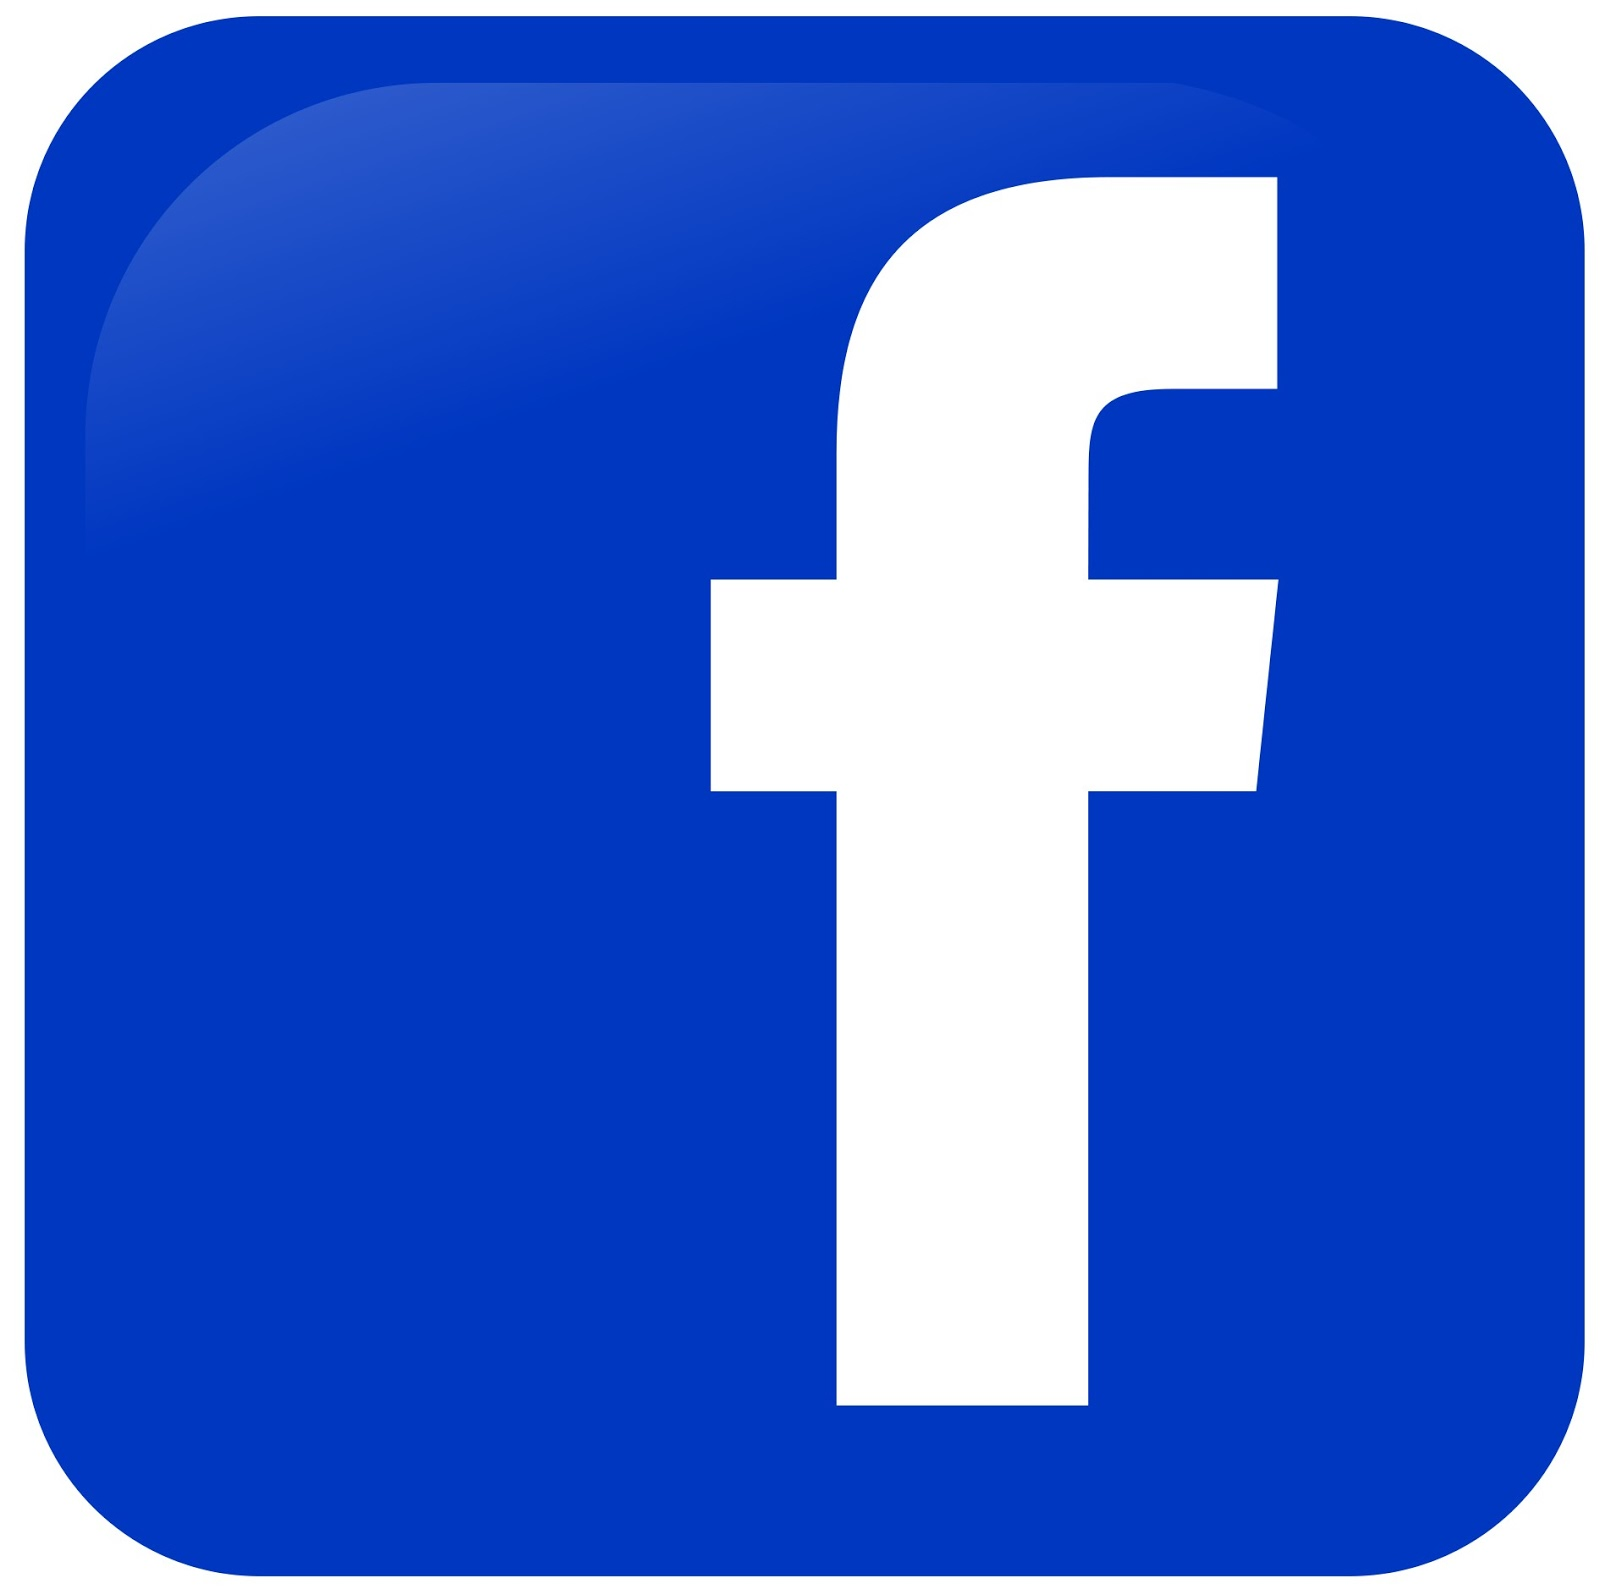 Bobook clipart face 4 com facebook clipart clipart